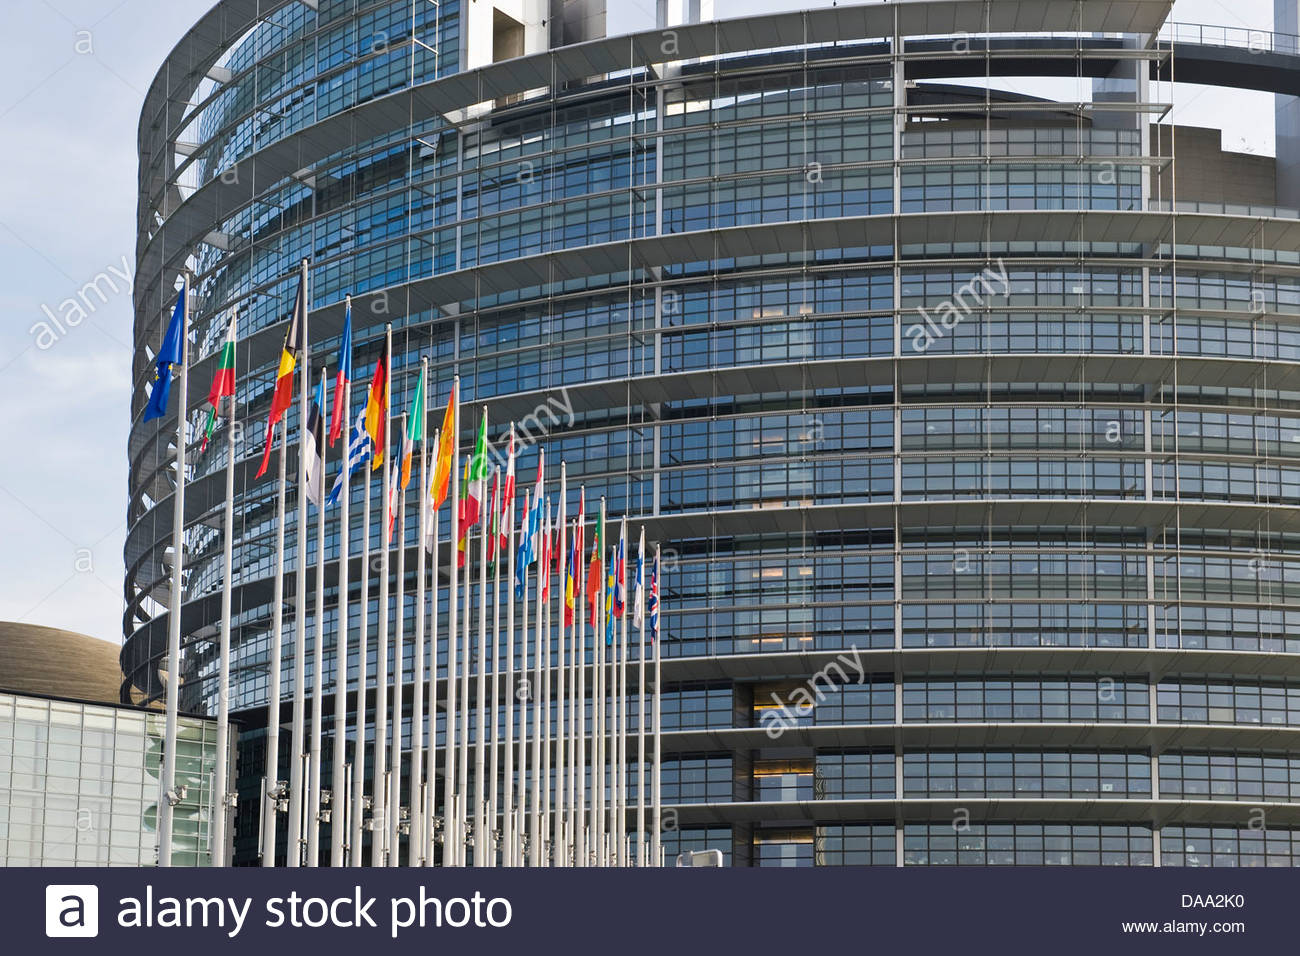 France,Alsace,Strasbourg,European Parliament building - Stock Image